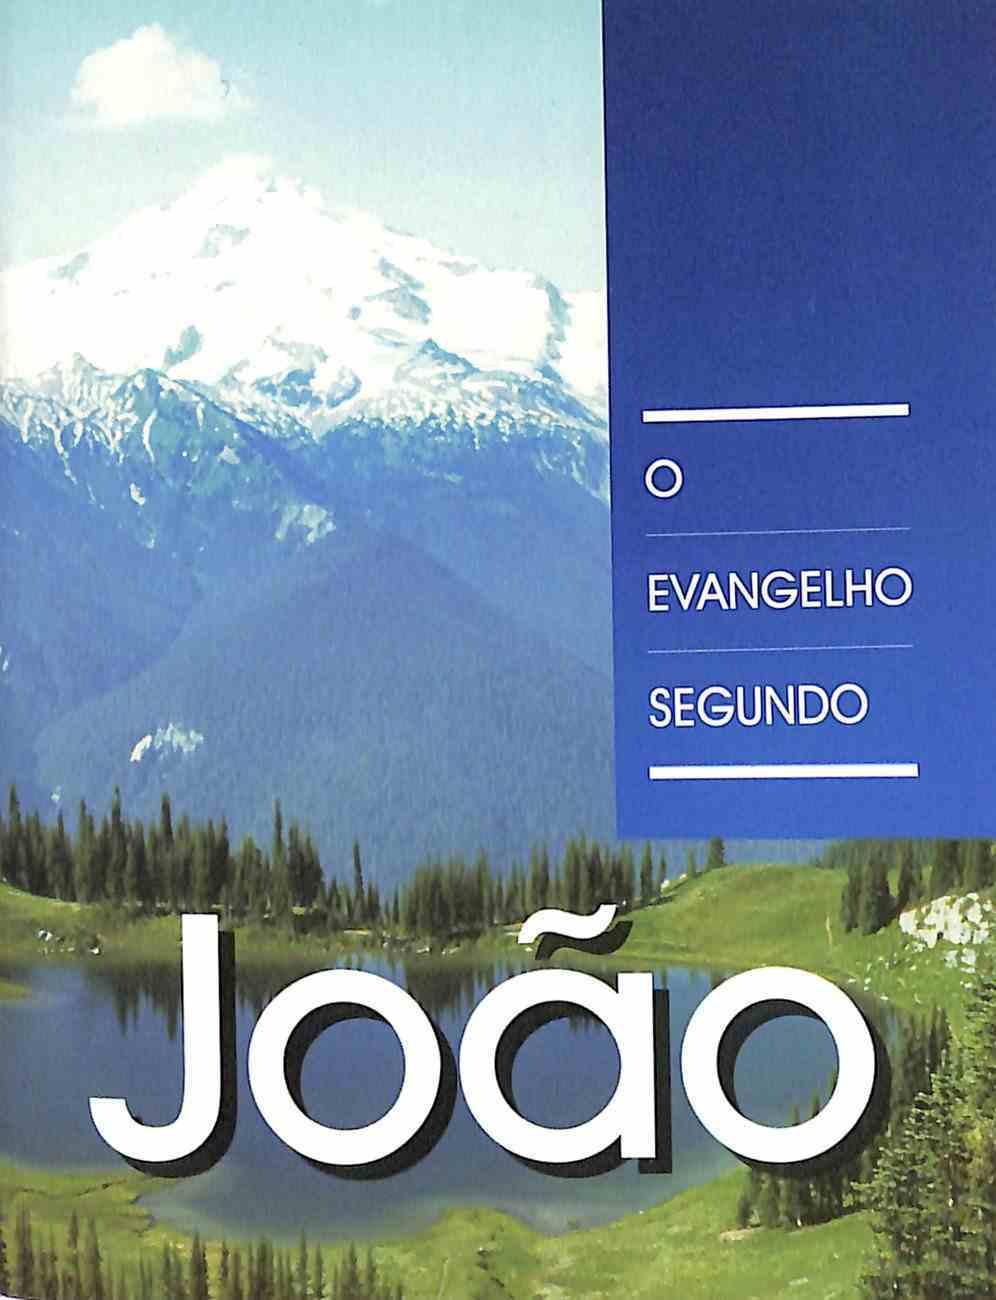 Portuguese Almedia Revised Gospel According to John (Black Letter Edition) Paperback